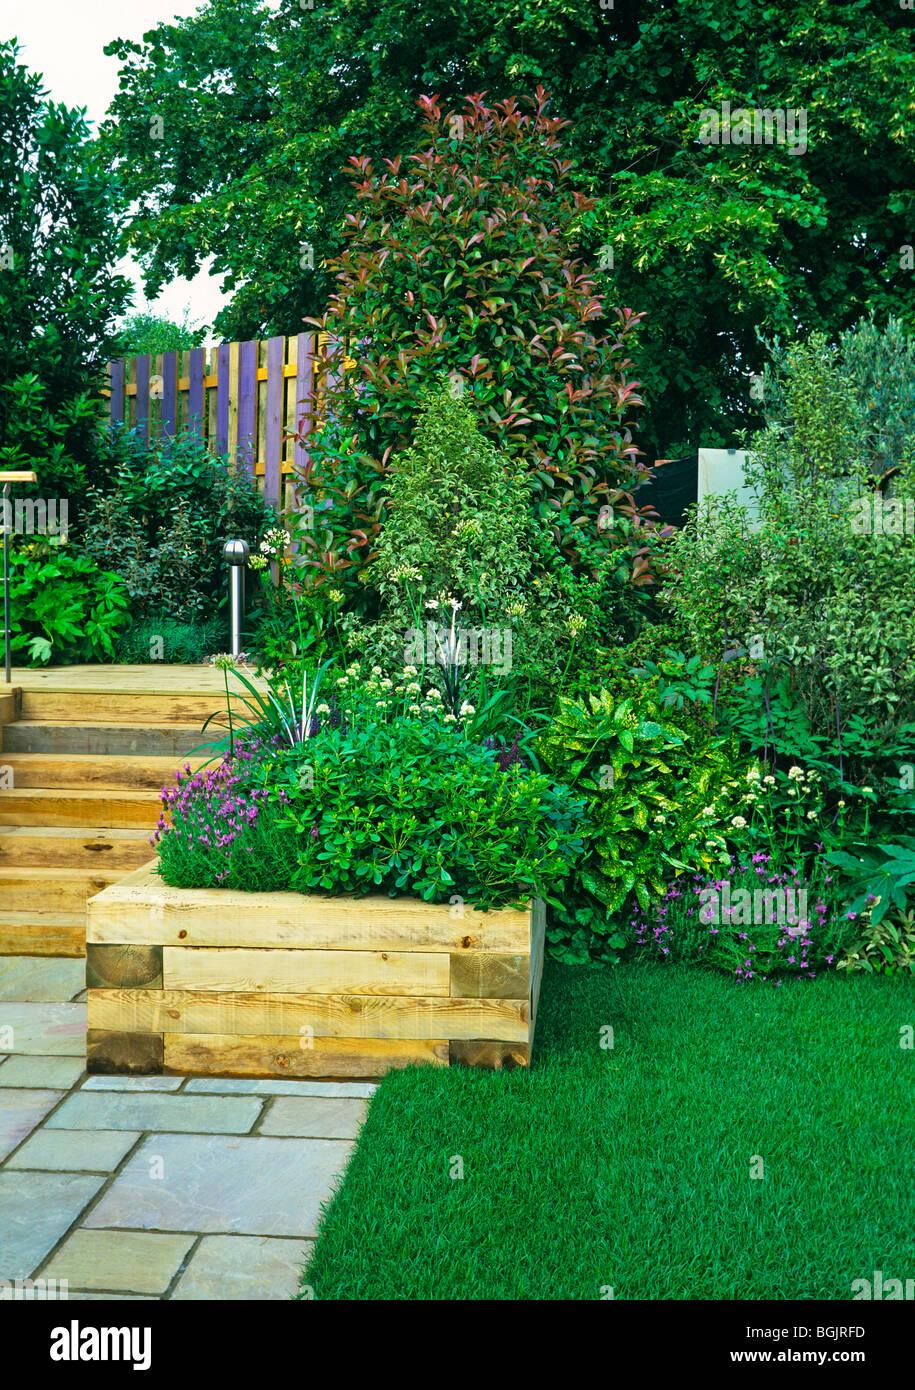 Detail of a small patio terrace in an urban garden Stock Photo